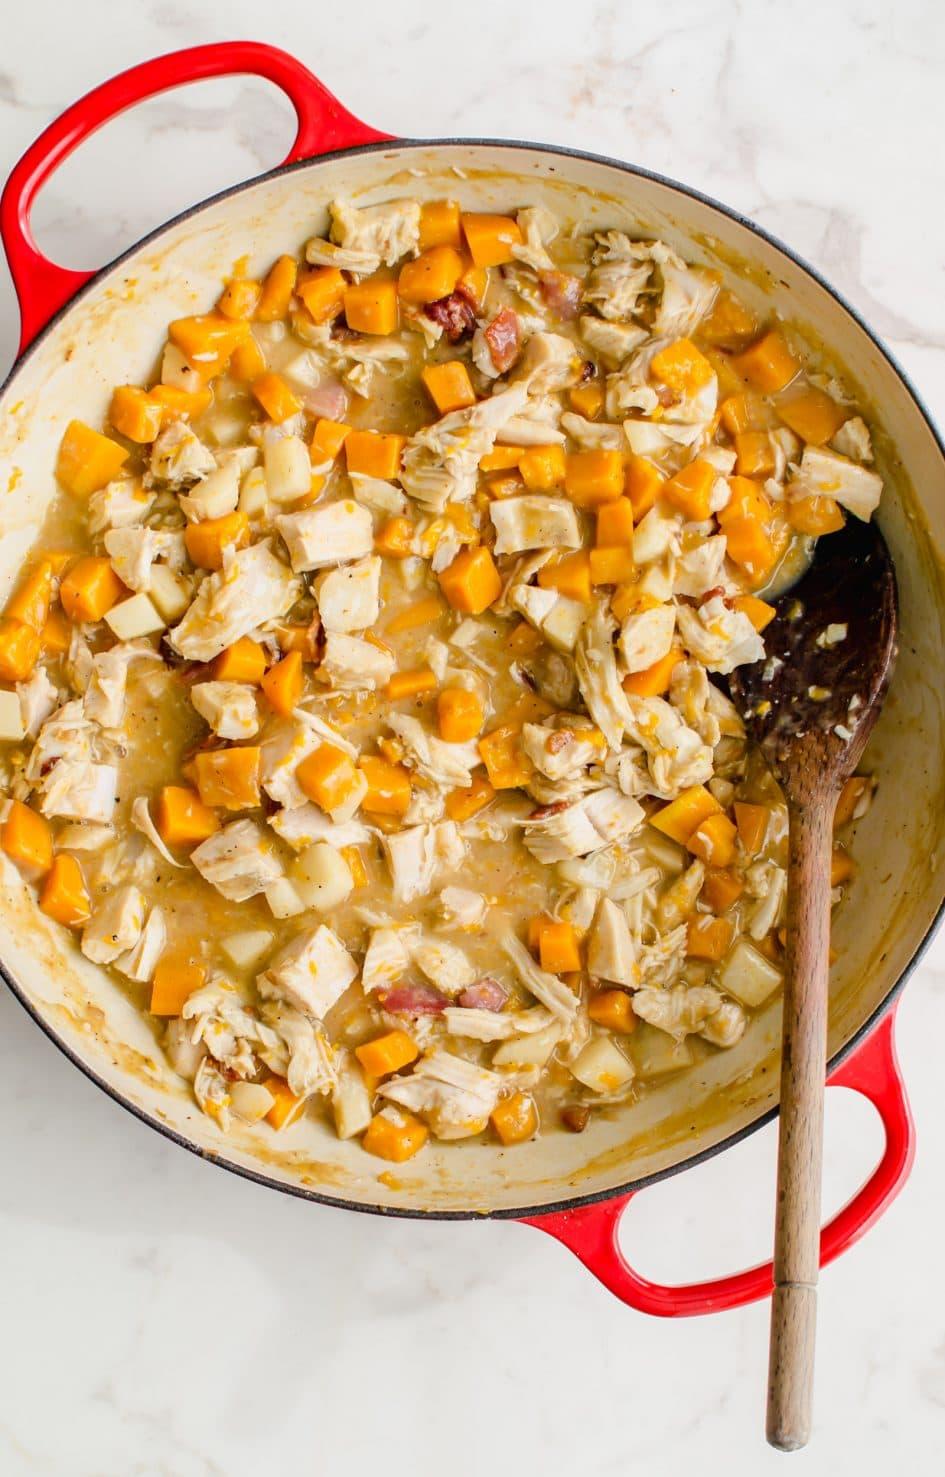 A pot with turkey pot pie filling.